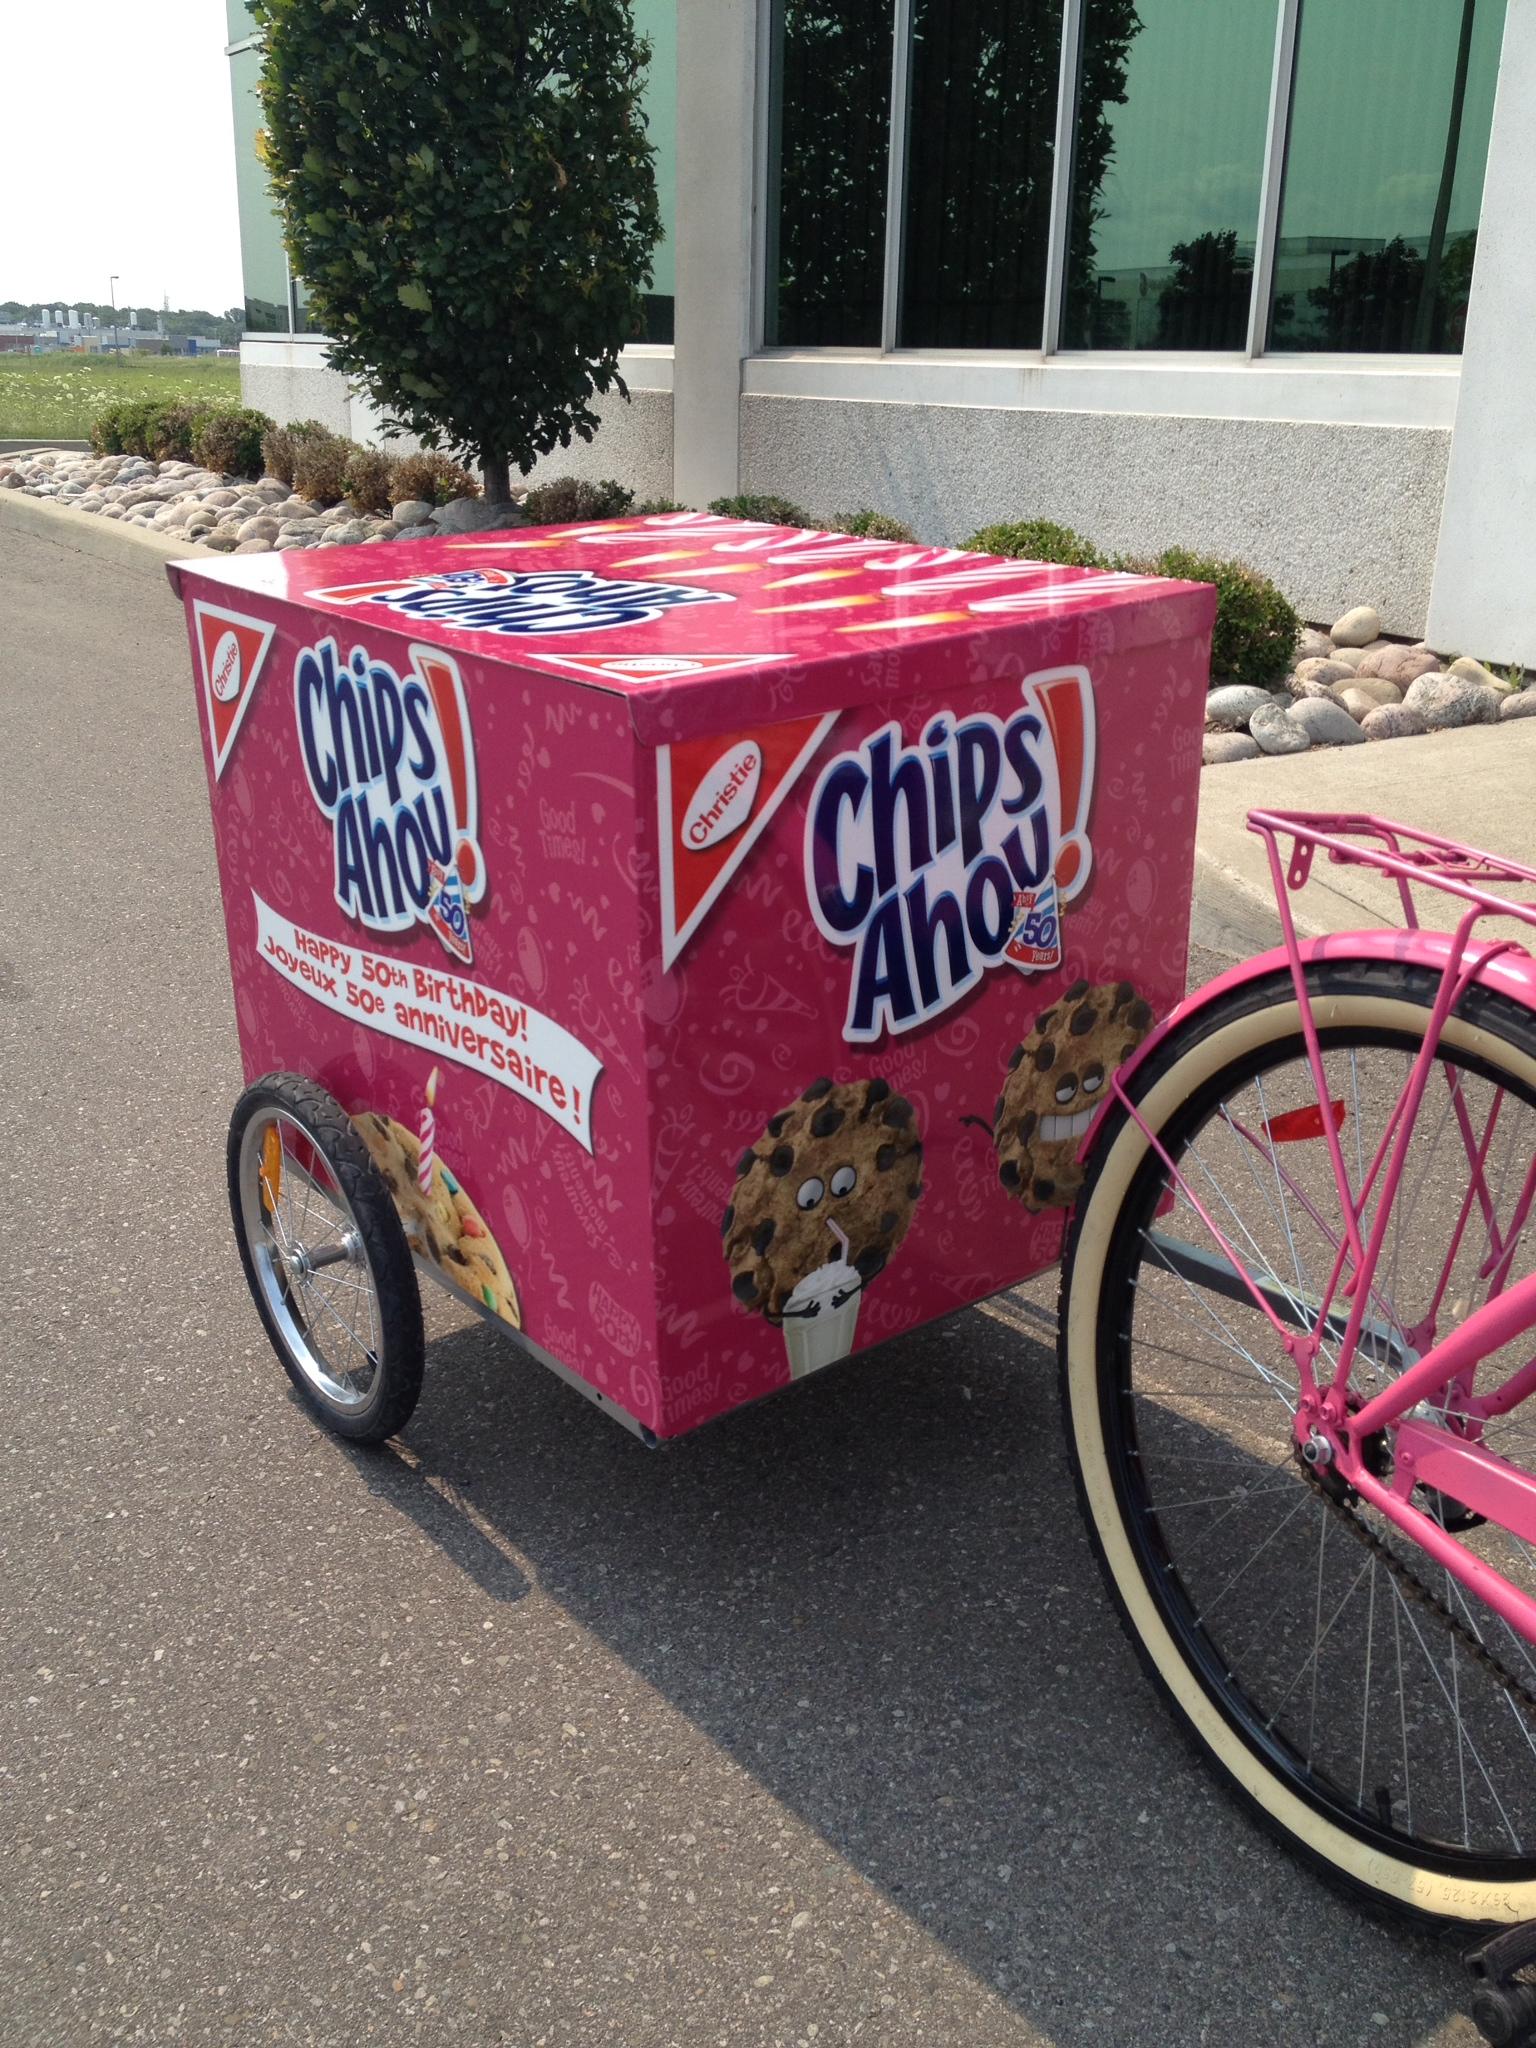 Bike trailer vinyl wrap - Chips Ahoy